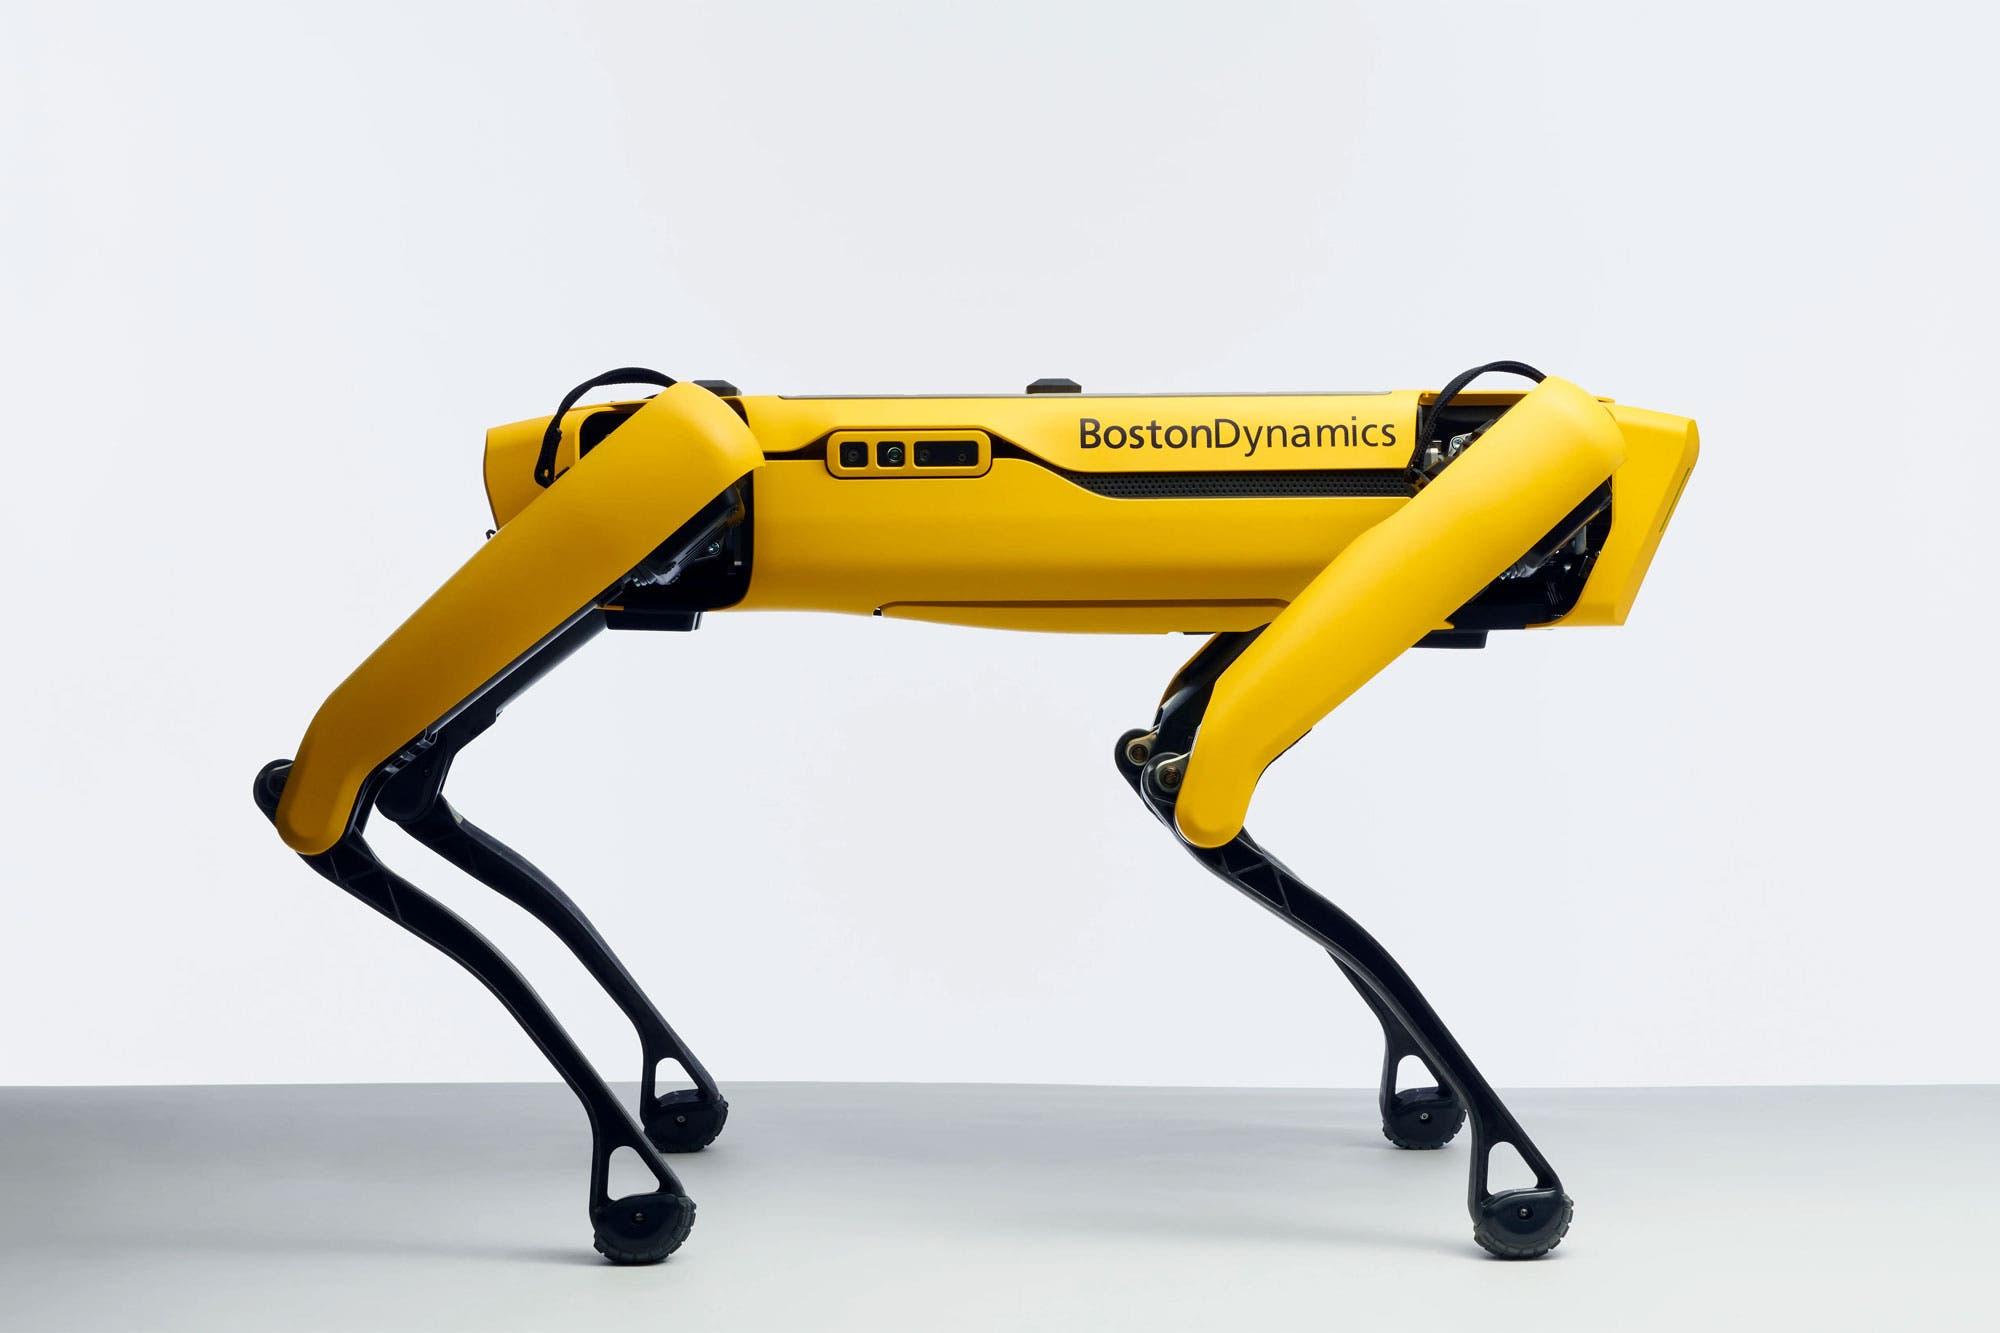 Boston Dynamics pone a la venta a robot cuadrúpedo Spot por 74.500 dólares